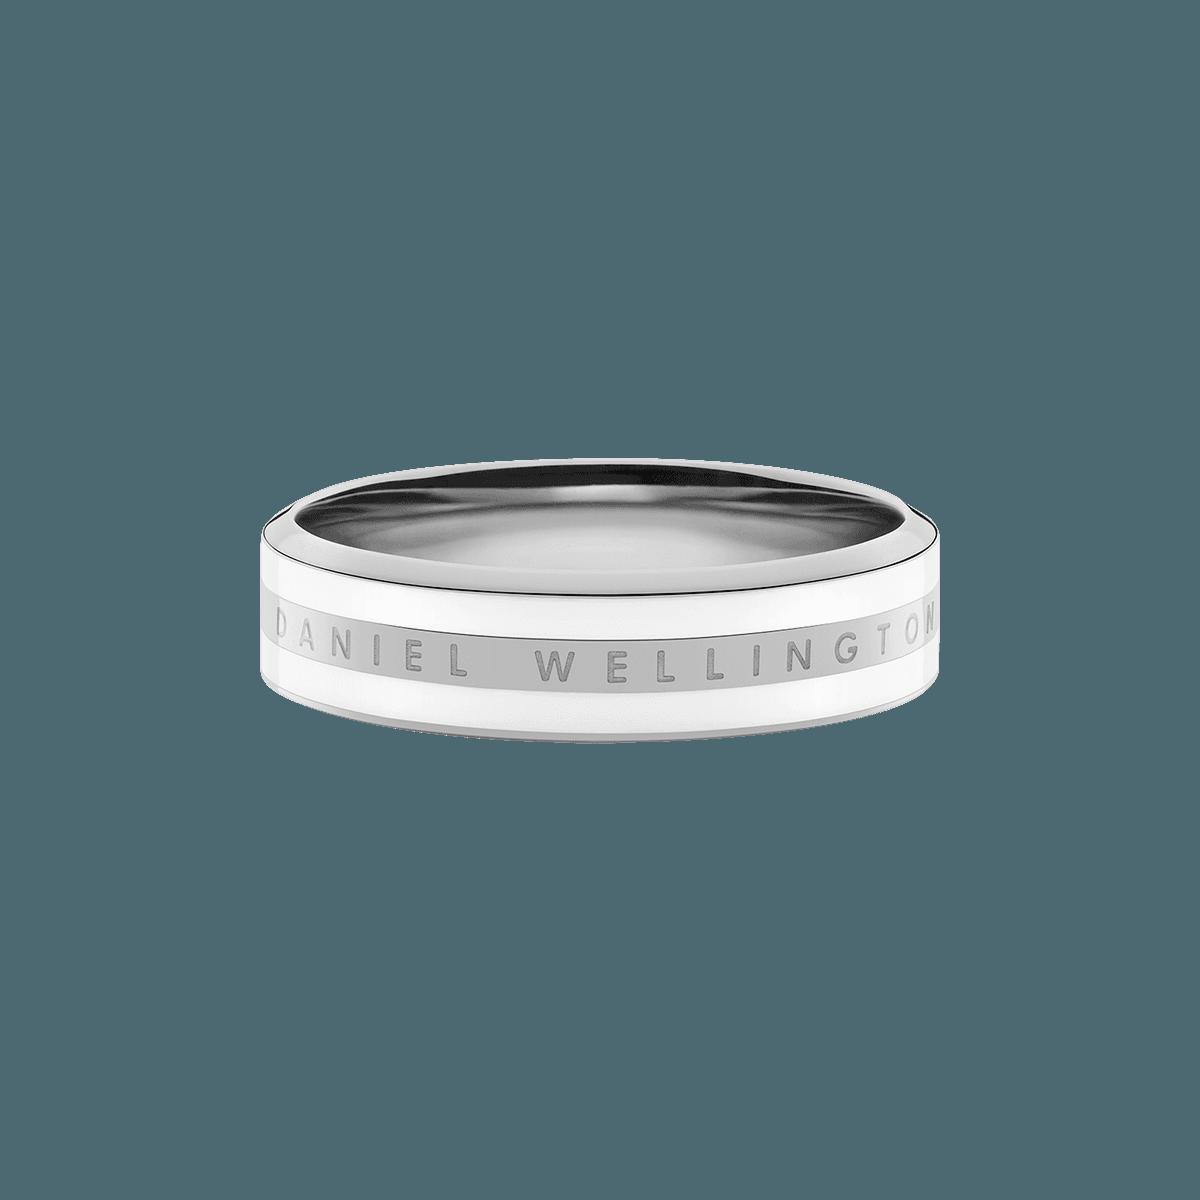 dw官网 dw手表官网 dw中国官网 dw官方旗舰店 DW DW官网  Classic Ring Satin White Silver 60mm